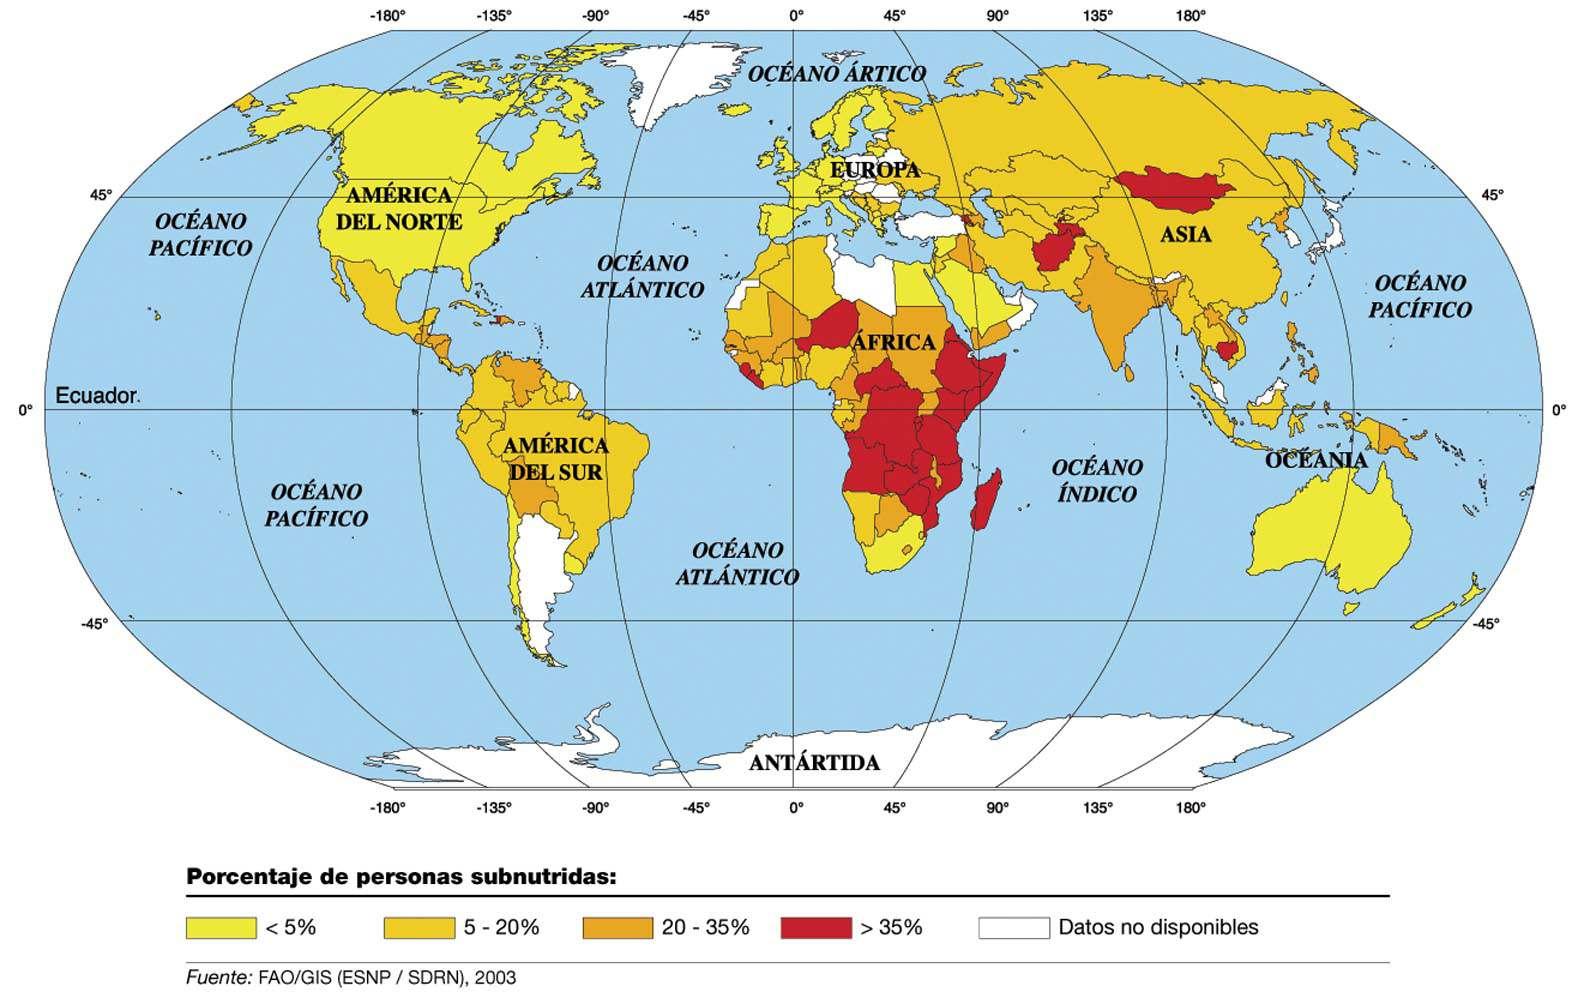 Mapa Múndi Para Imprimir  Continentes E Países